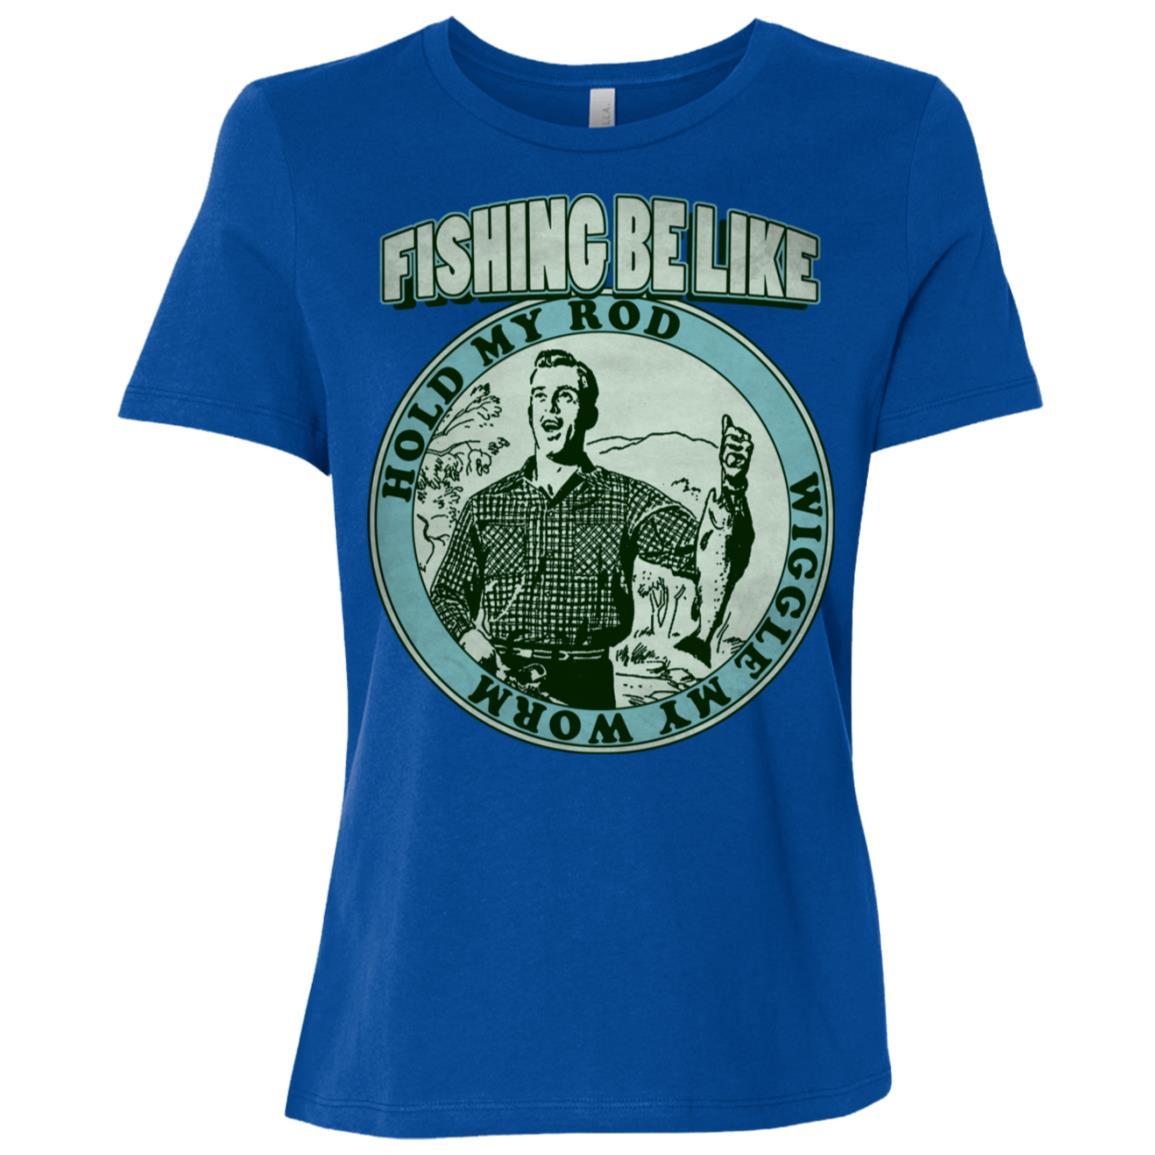 Fishing Be Like Hold My Rod Wiggle My Worm (Cyan) Women Short Sleeve T-Shirt